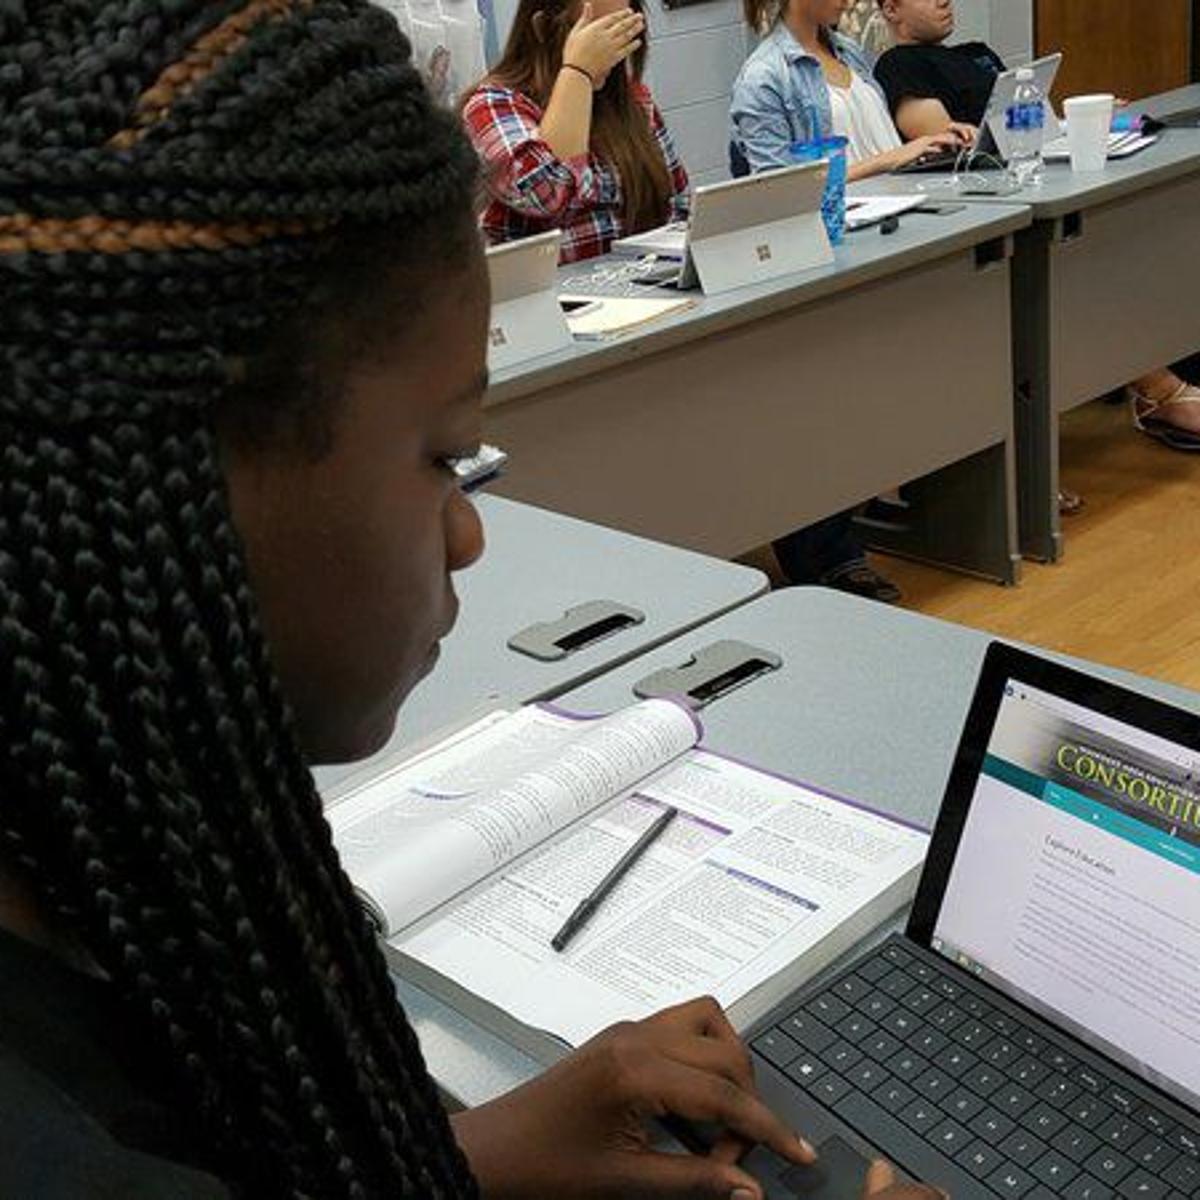 U S Department Of Education Launches New Idea Website >> Muskogee Area Education Consortium Launches Website News